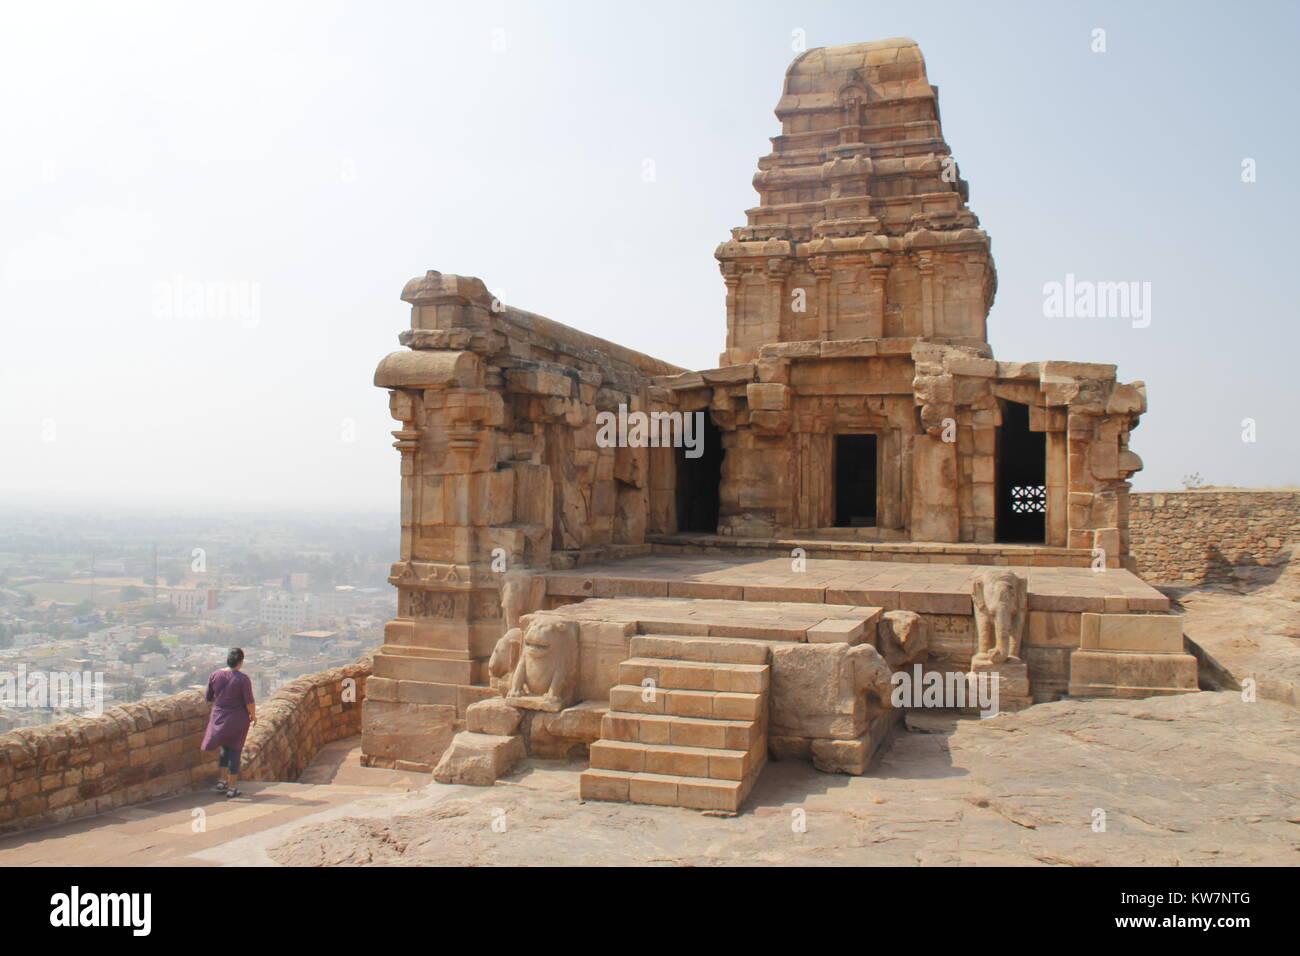 View of and from badami caves, karnataka, India - Stock Image